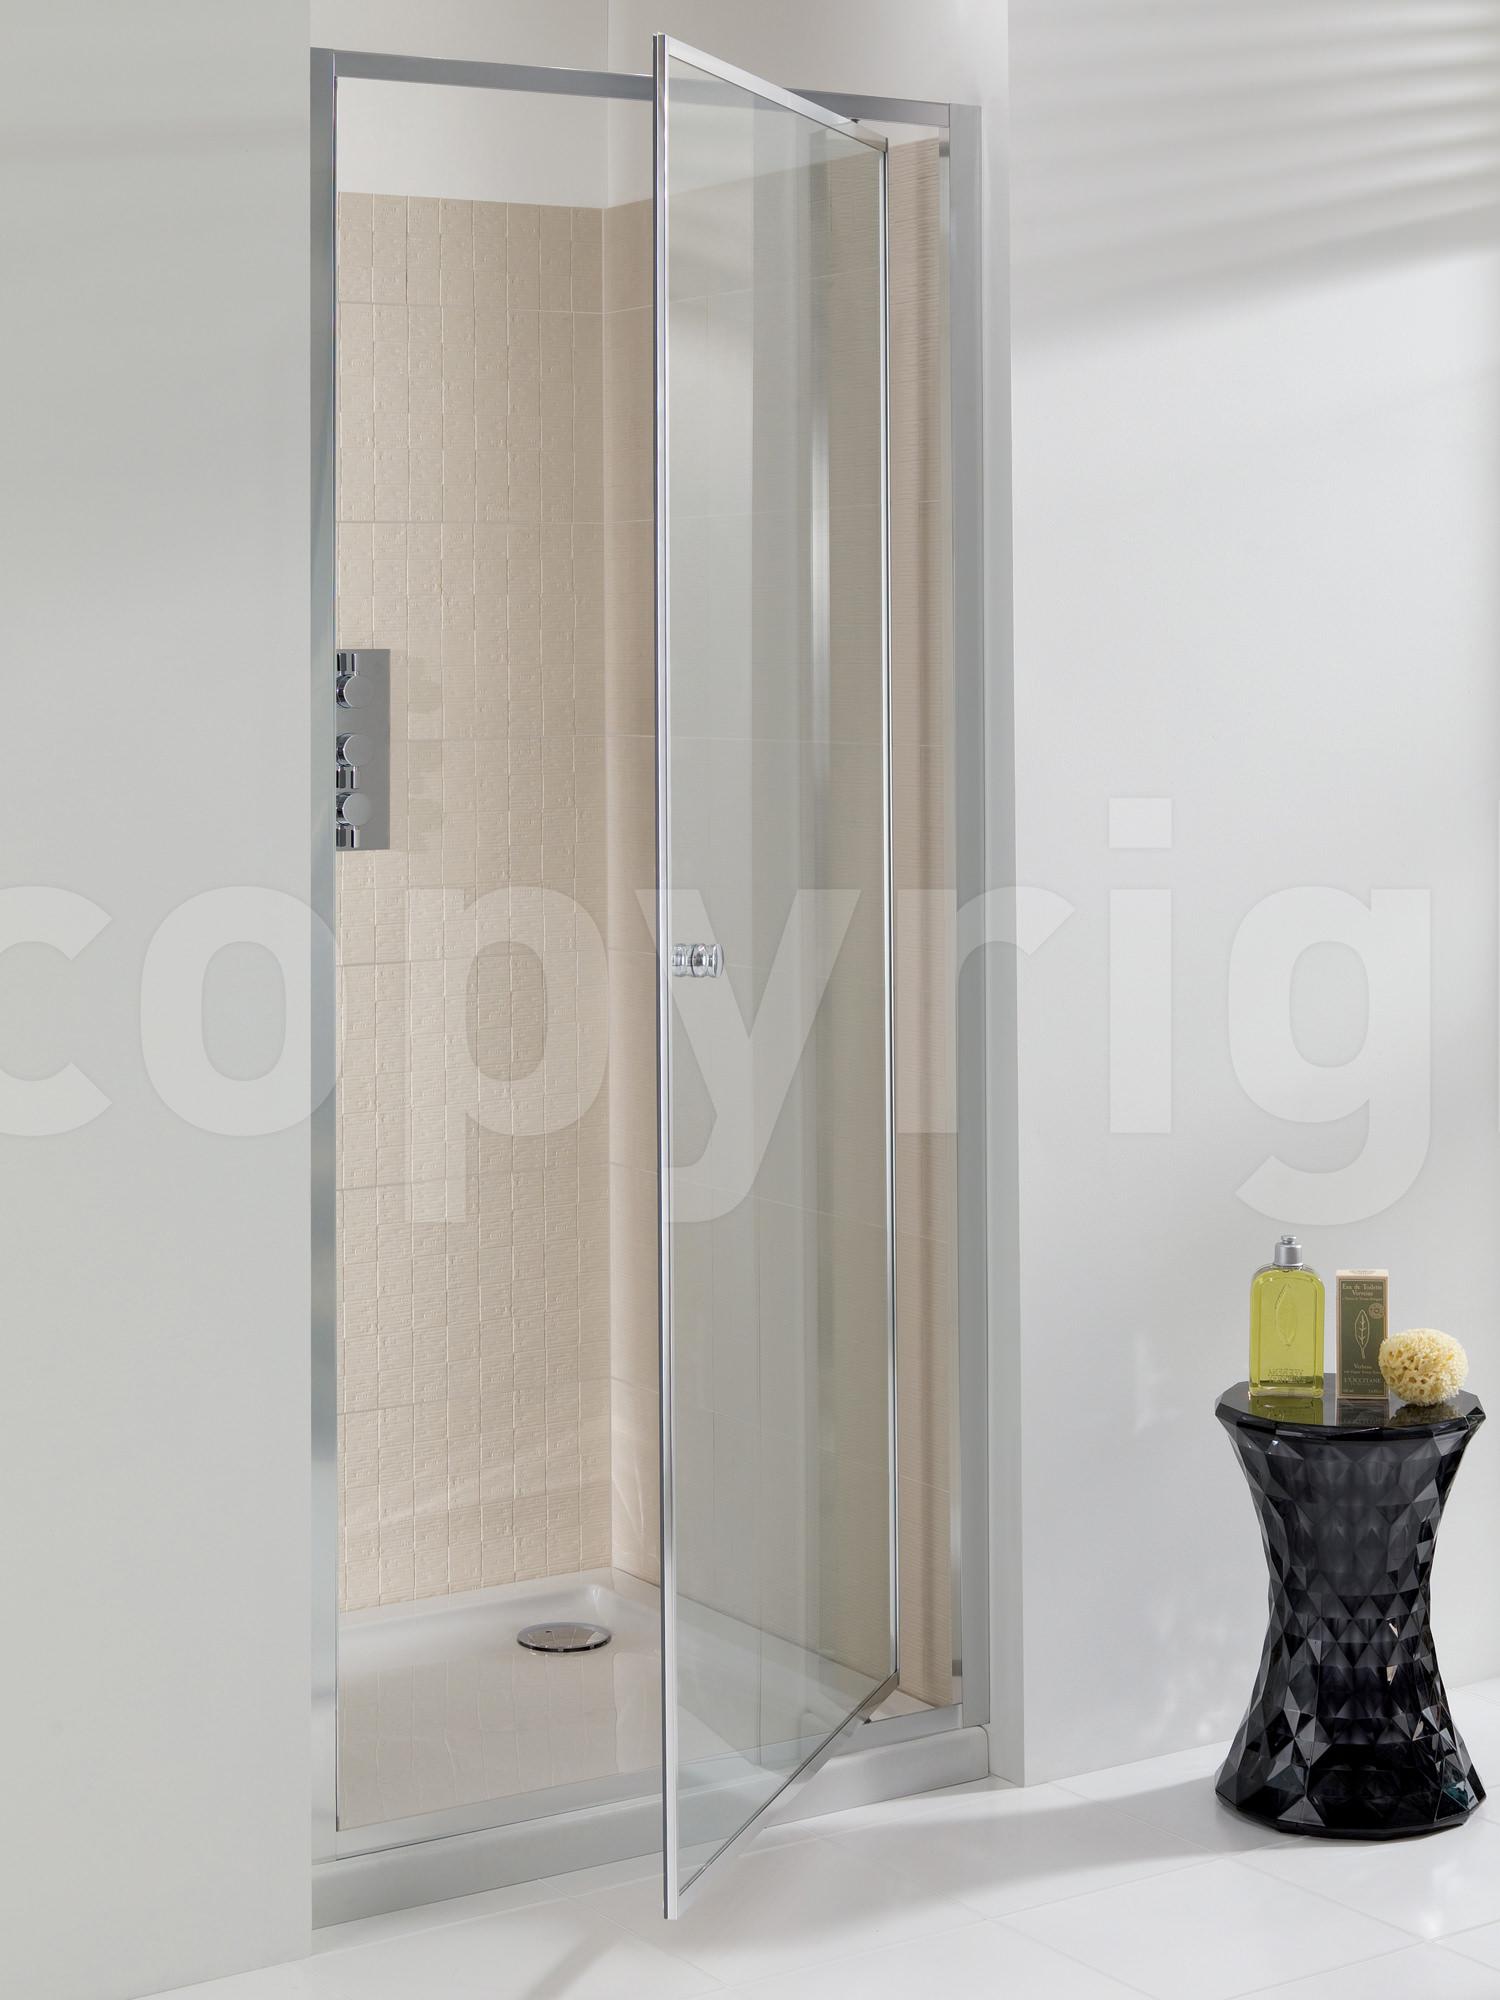 Edge 900mm pivot shower door simpsons edge 900mm pivot shower door planetlyrics Choice Image